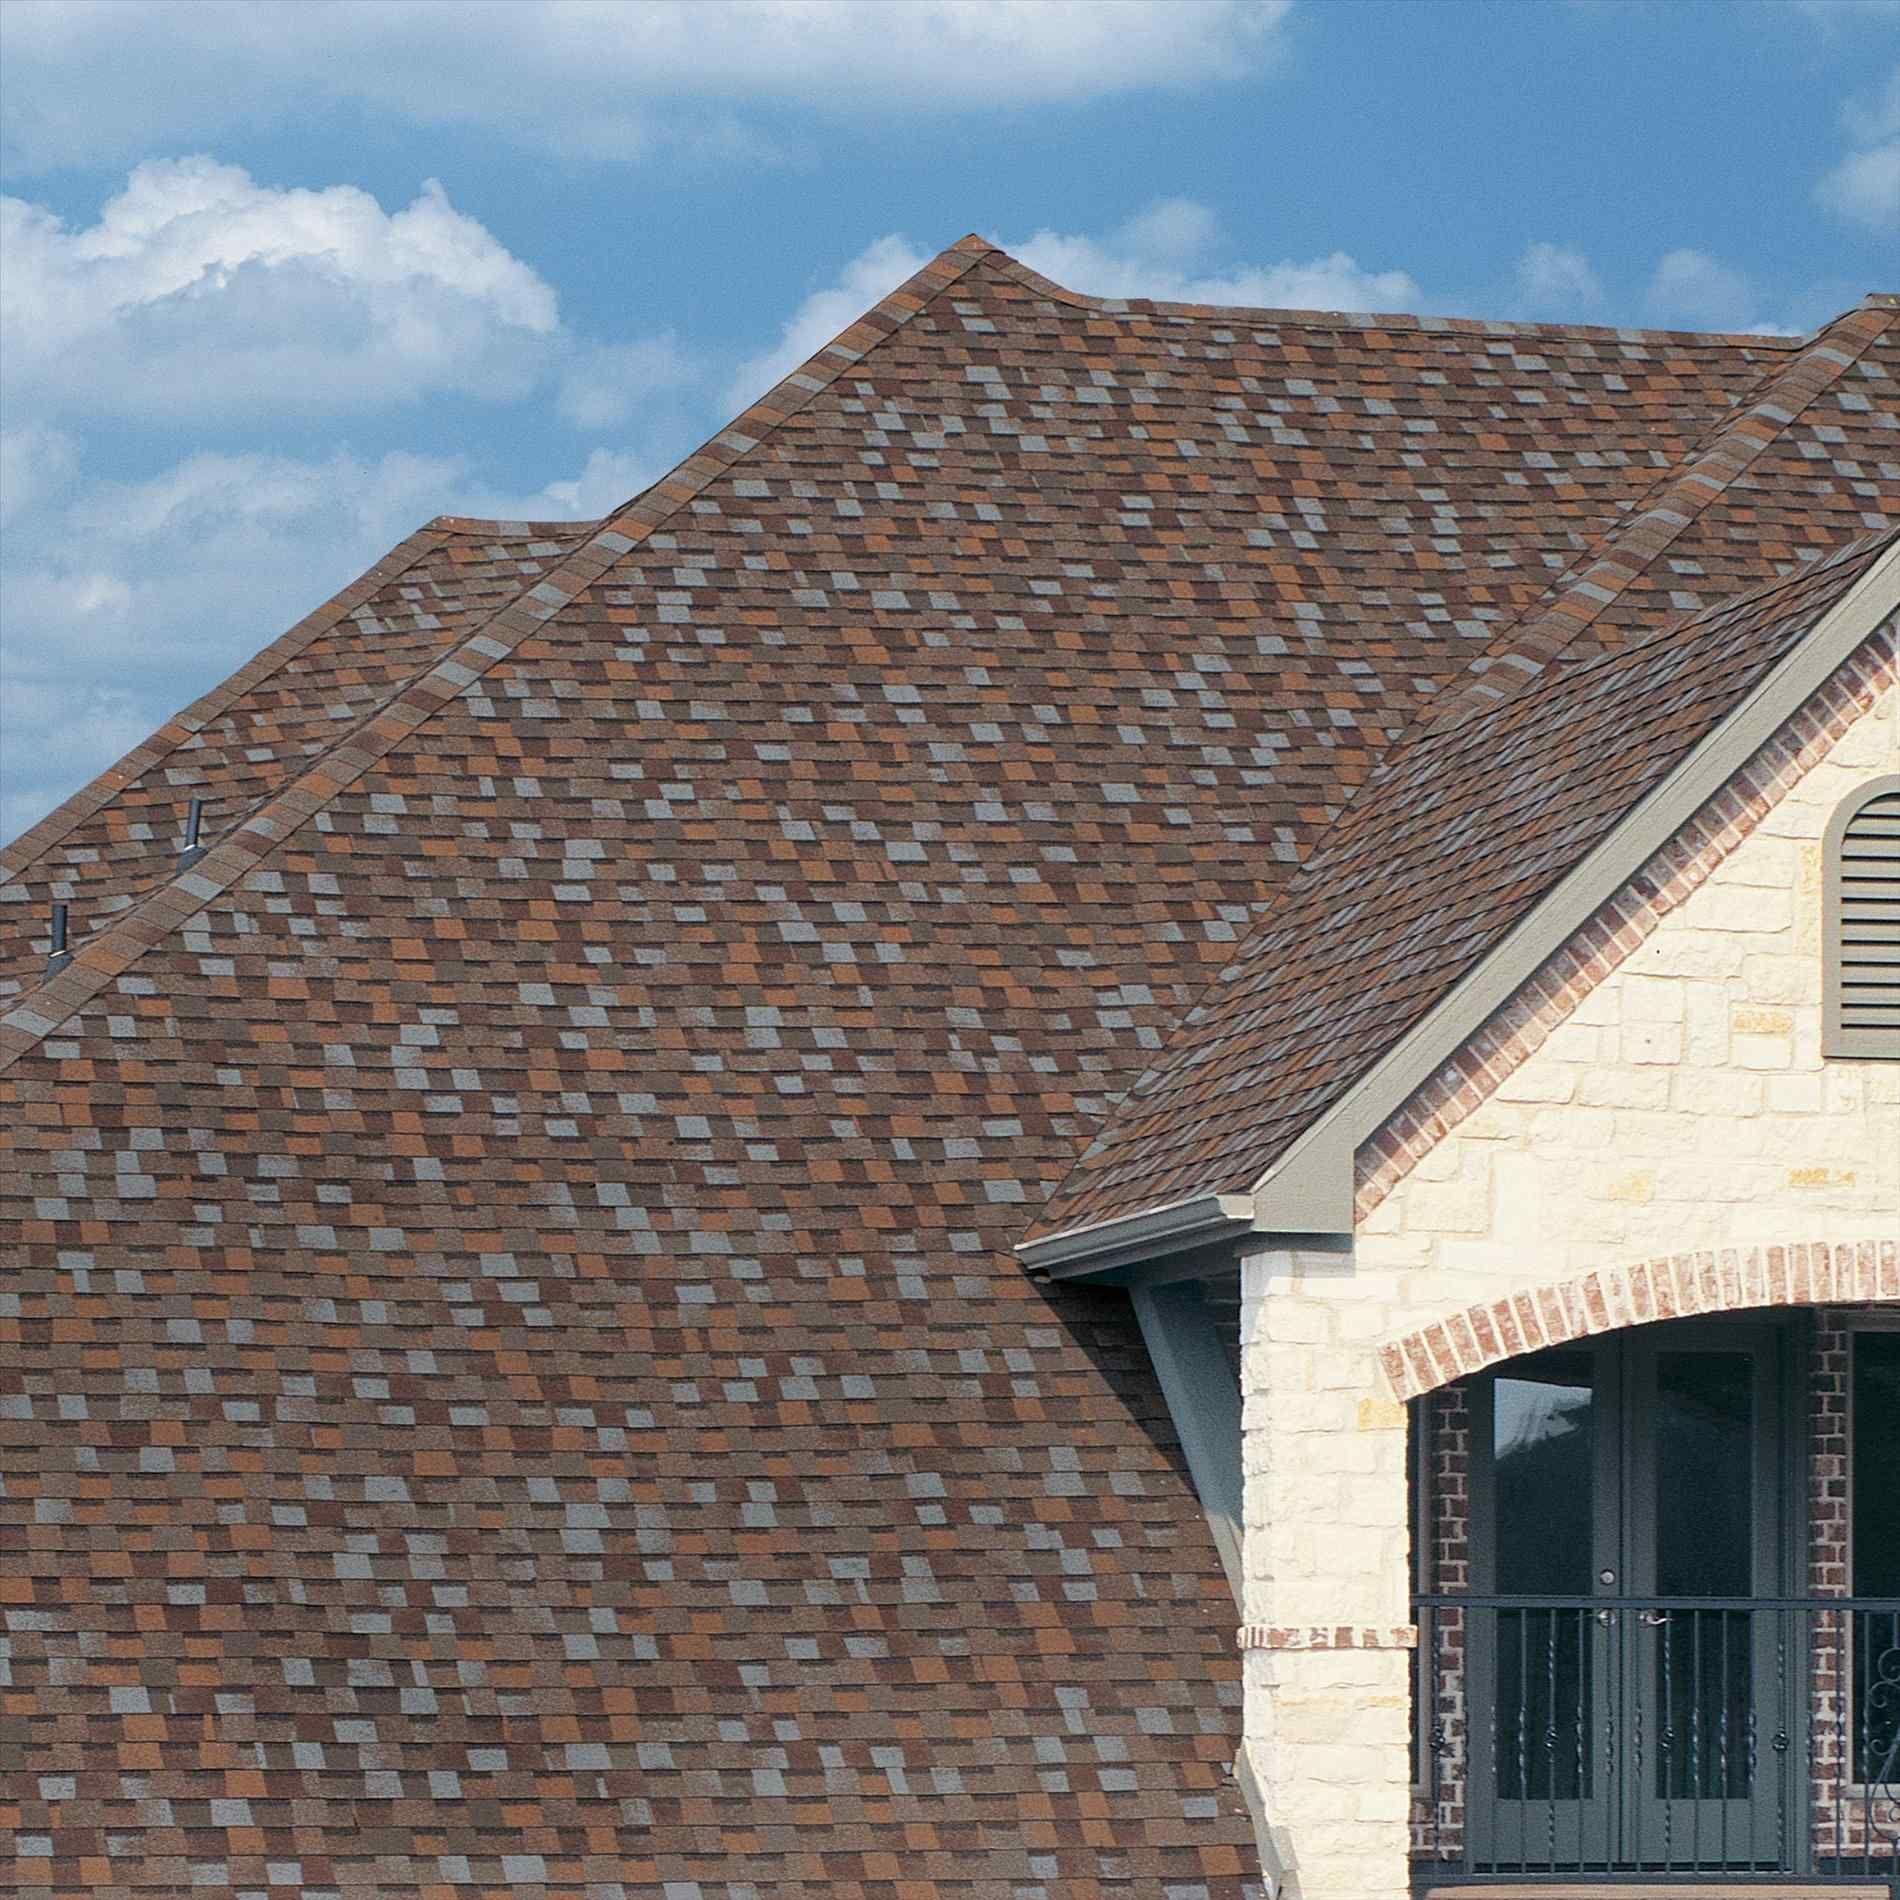 Best 3D Roof Shingles Roof Shingles Shingle Exterior Shingling 400 x 300